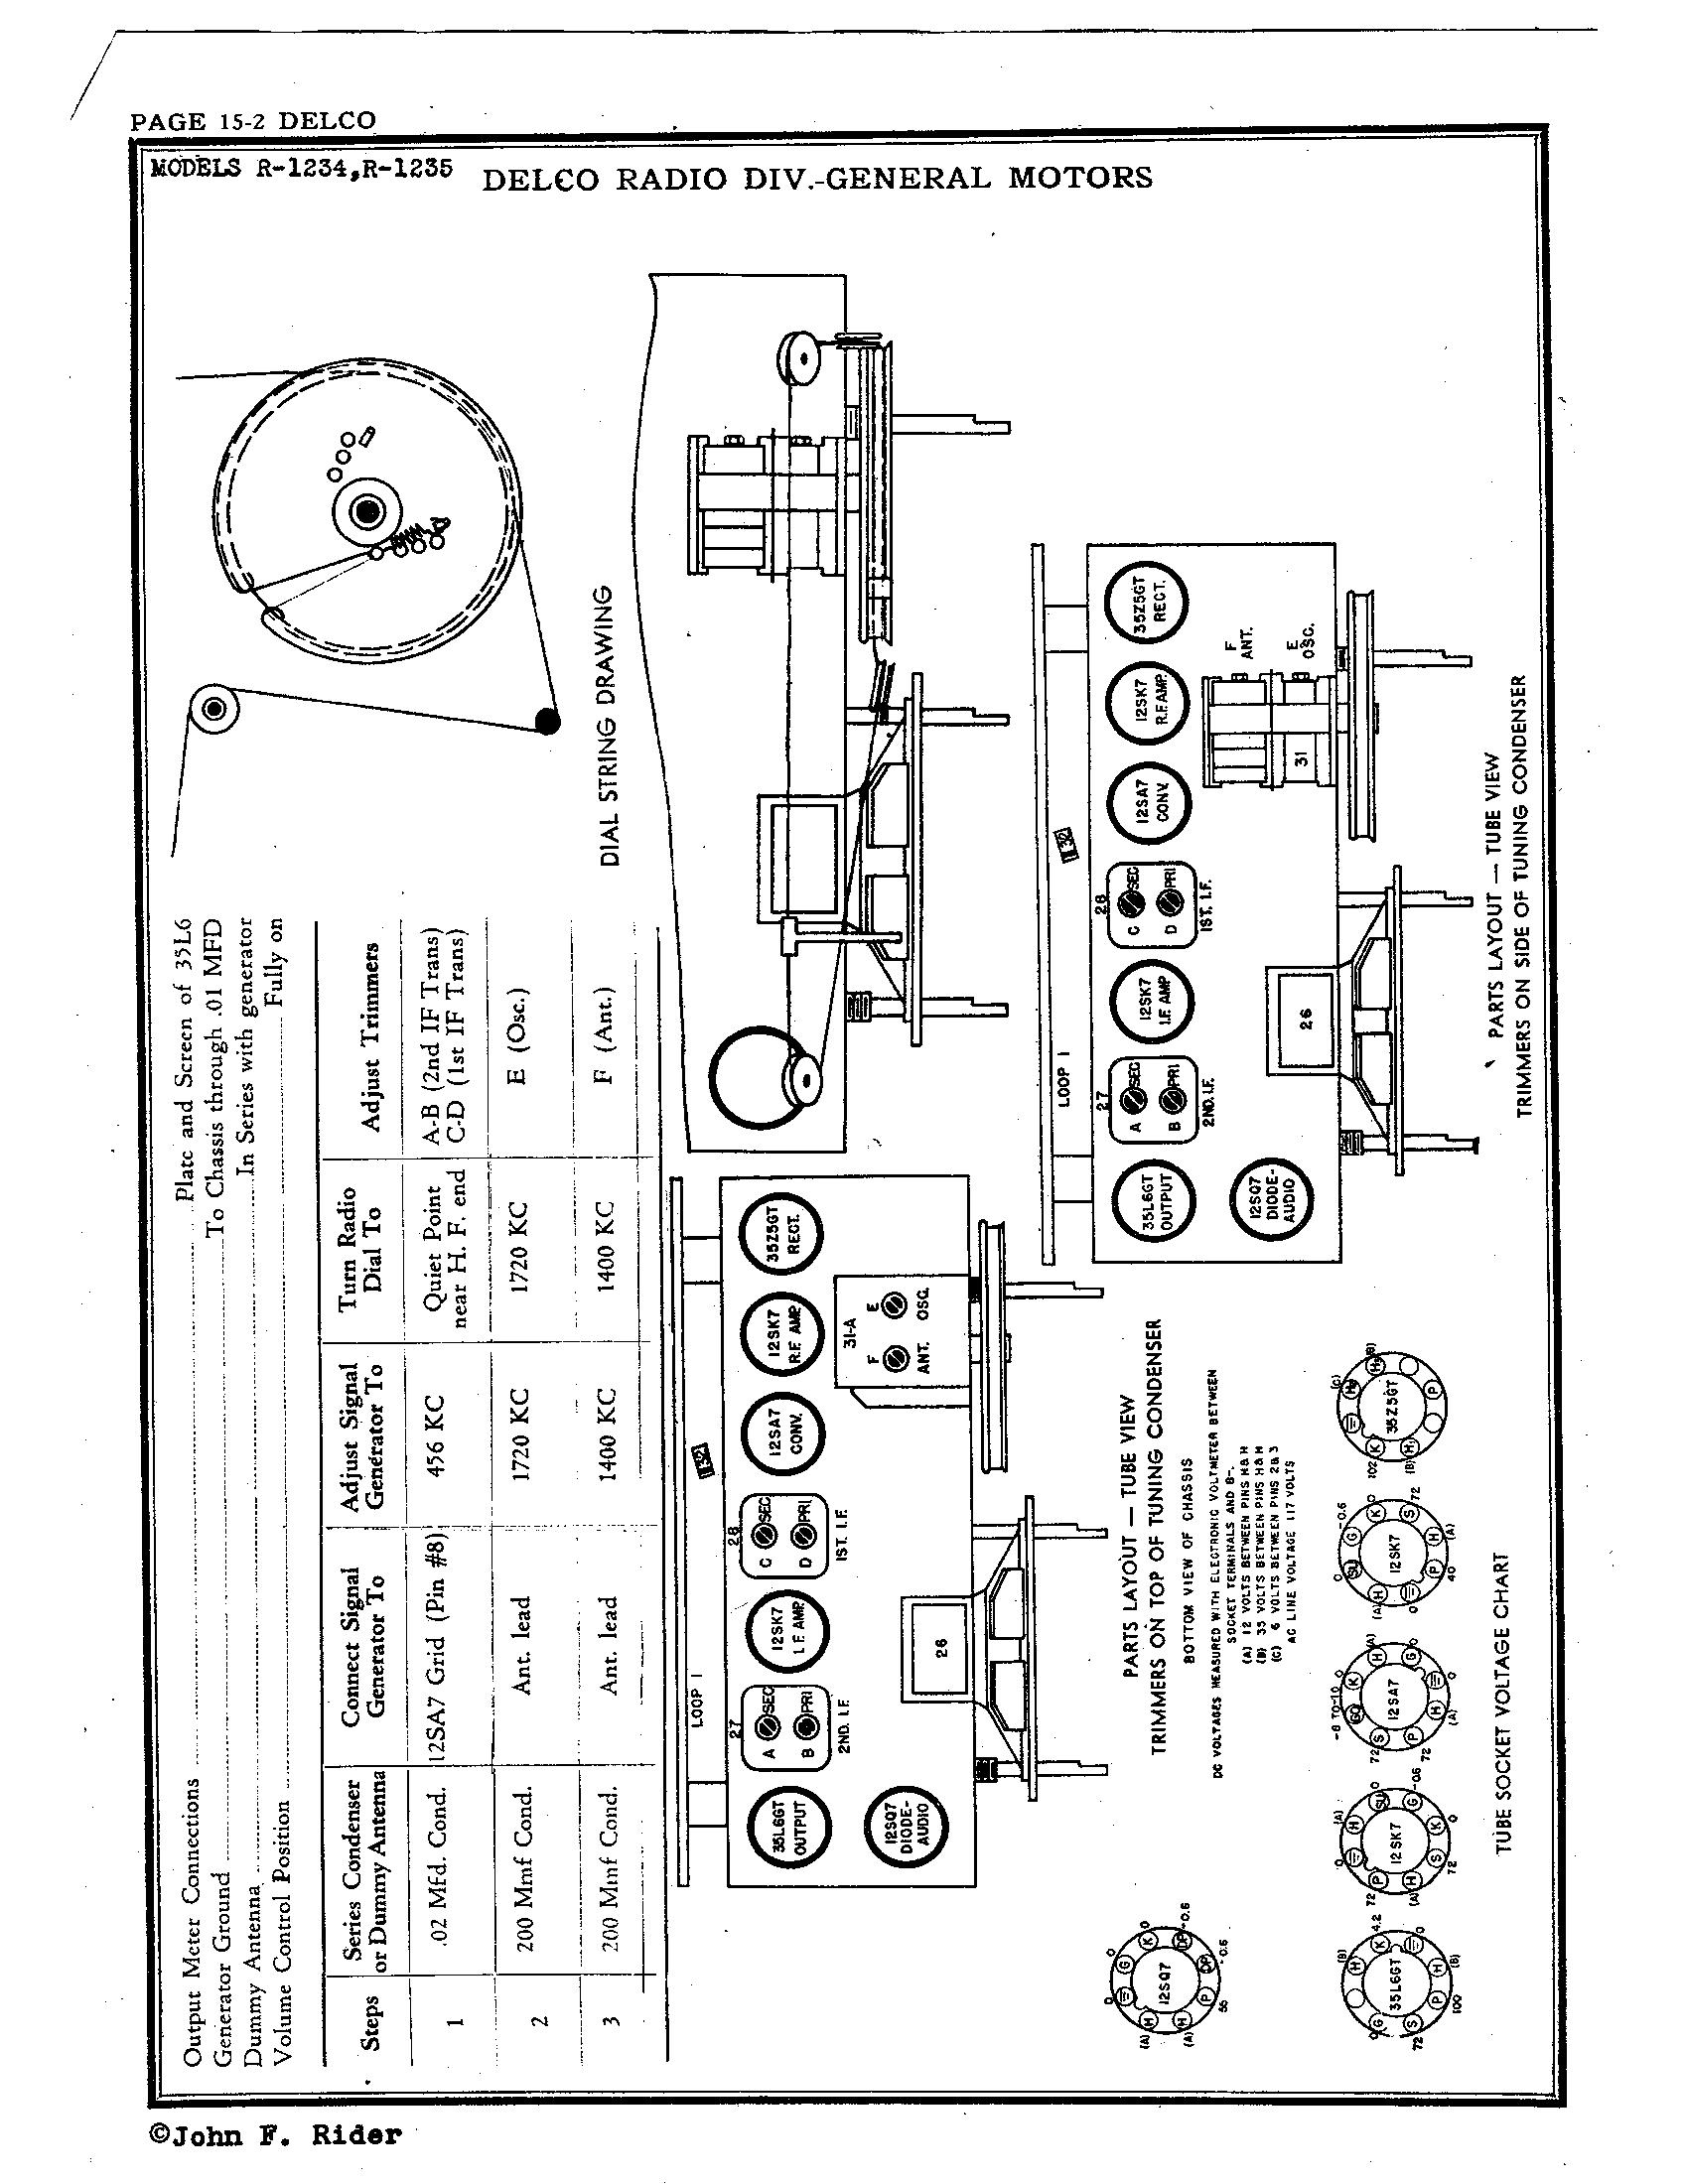 Delco Wiring Schematic